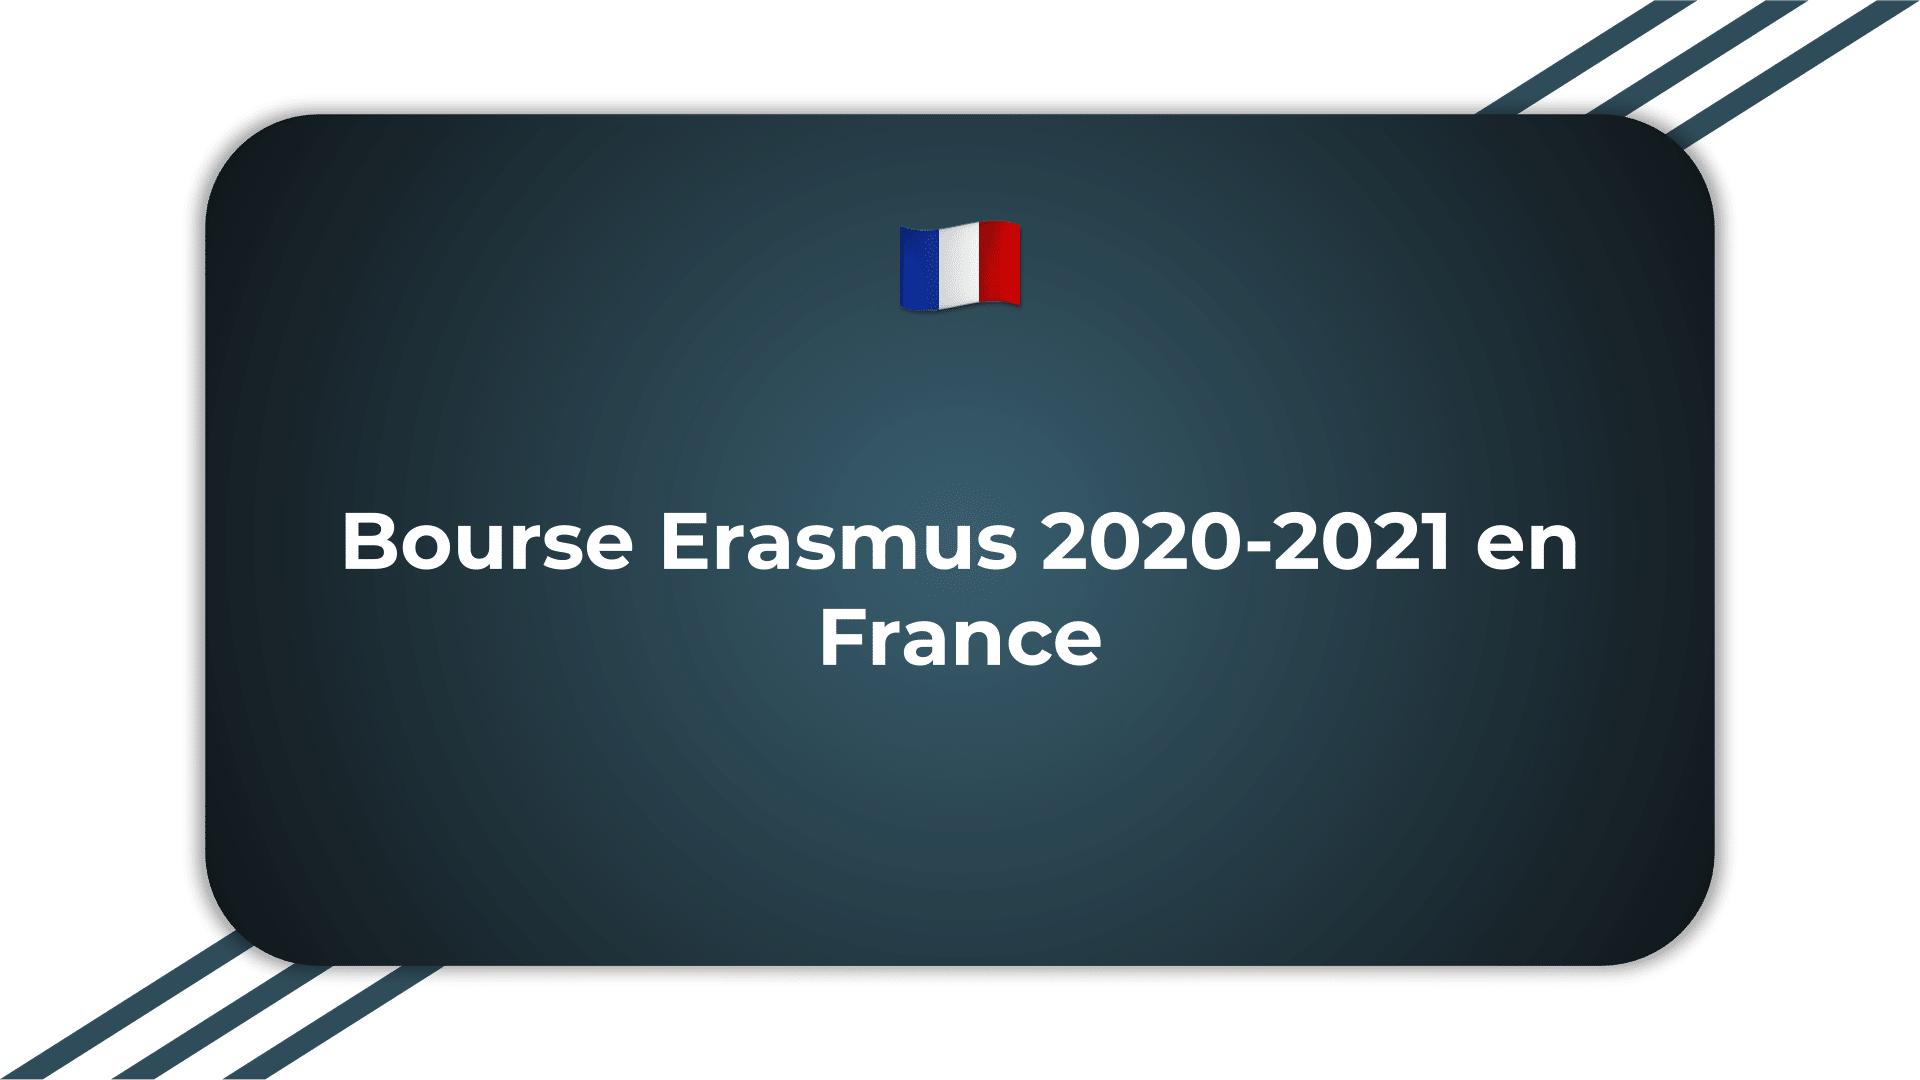 Bourse Erasmus France